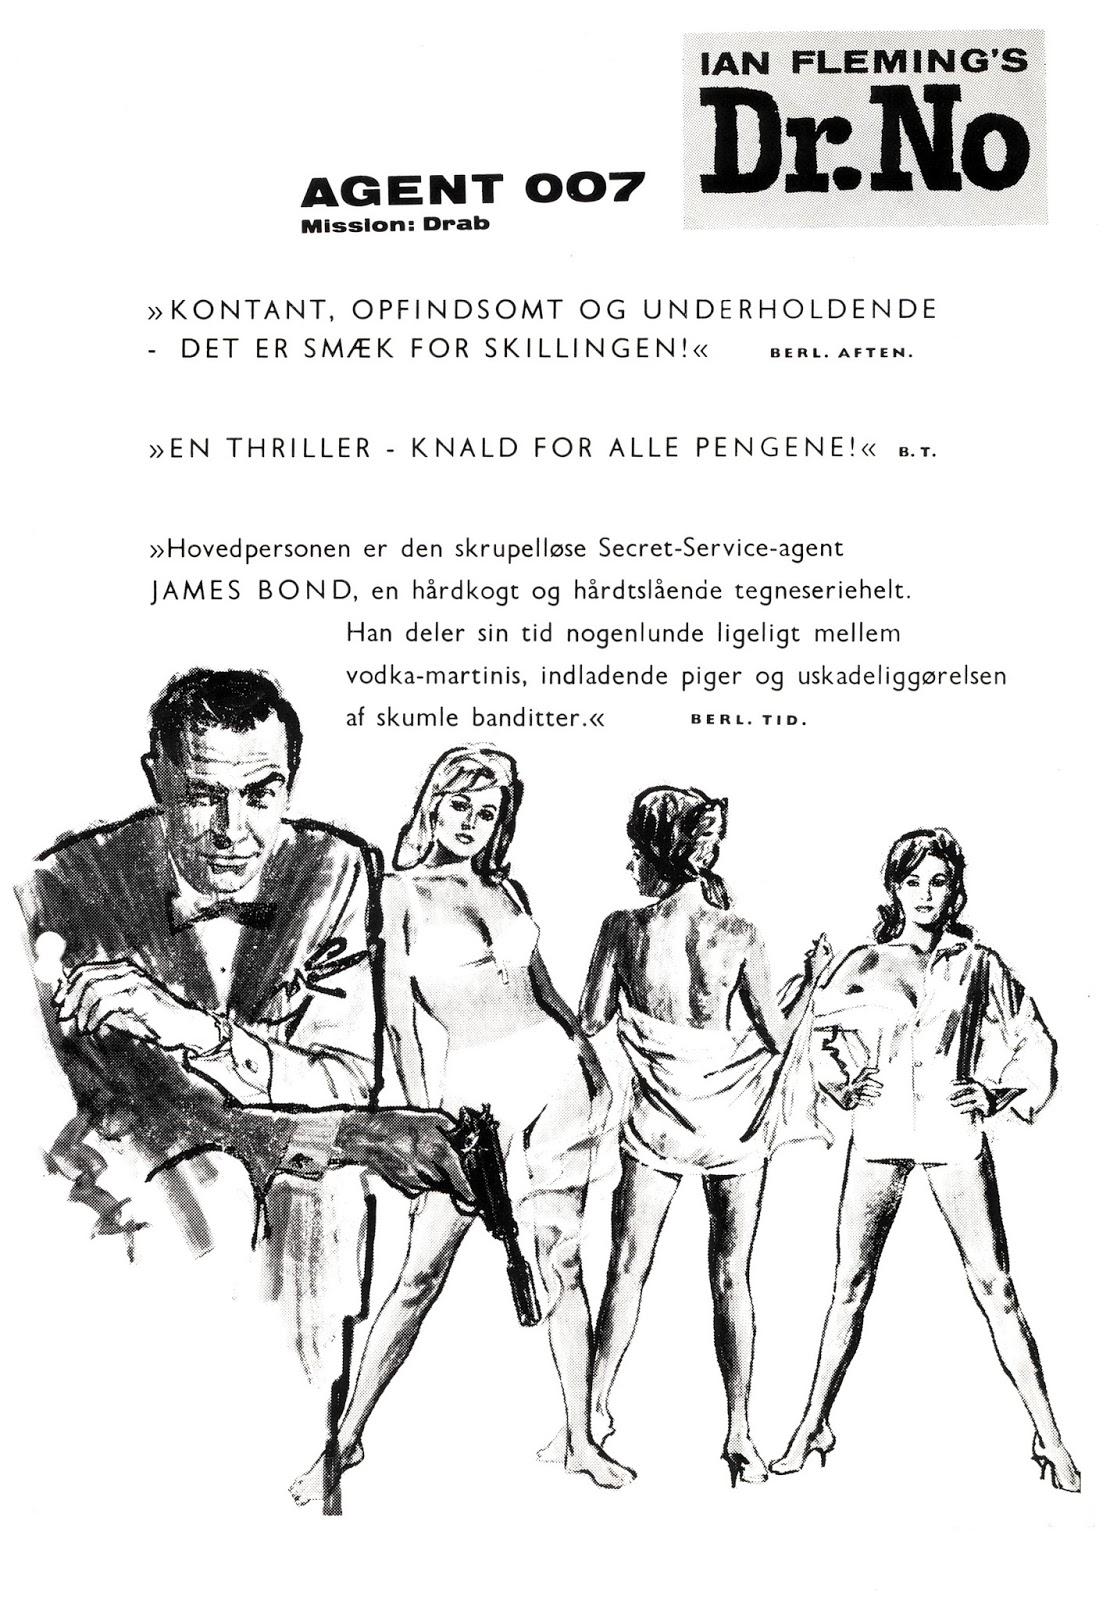 Dr. No - DK pressemateriale 2A